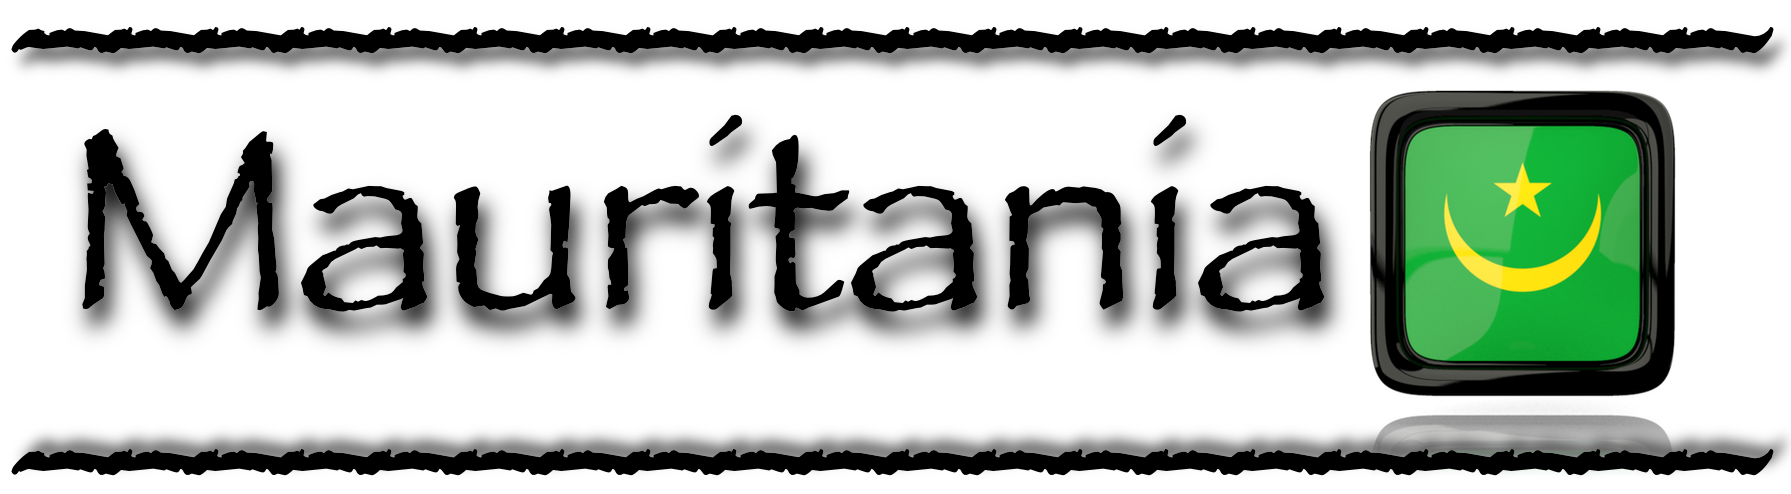 %22Realms%22 Typeface Mauritania 2.png